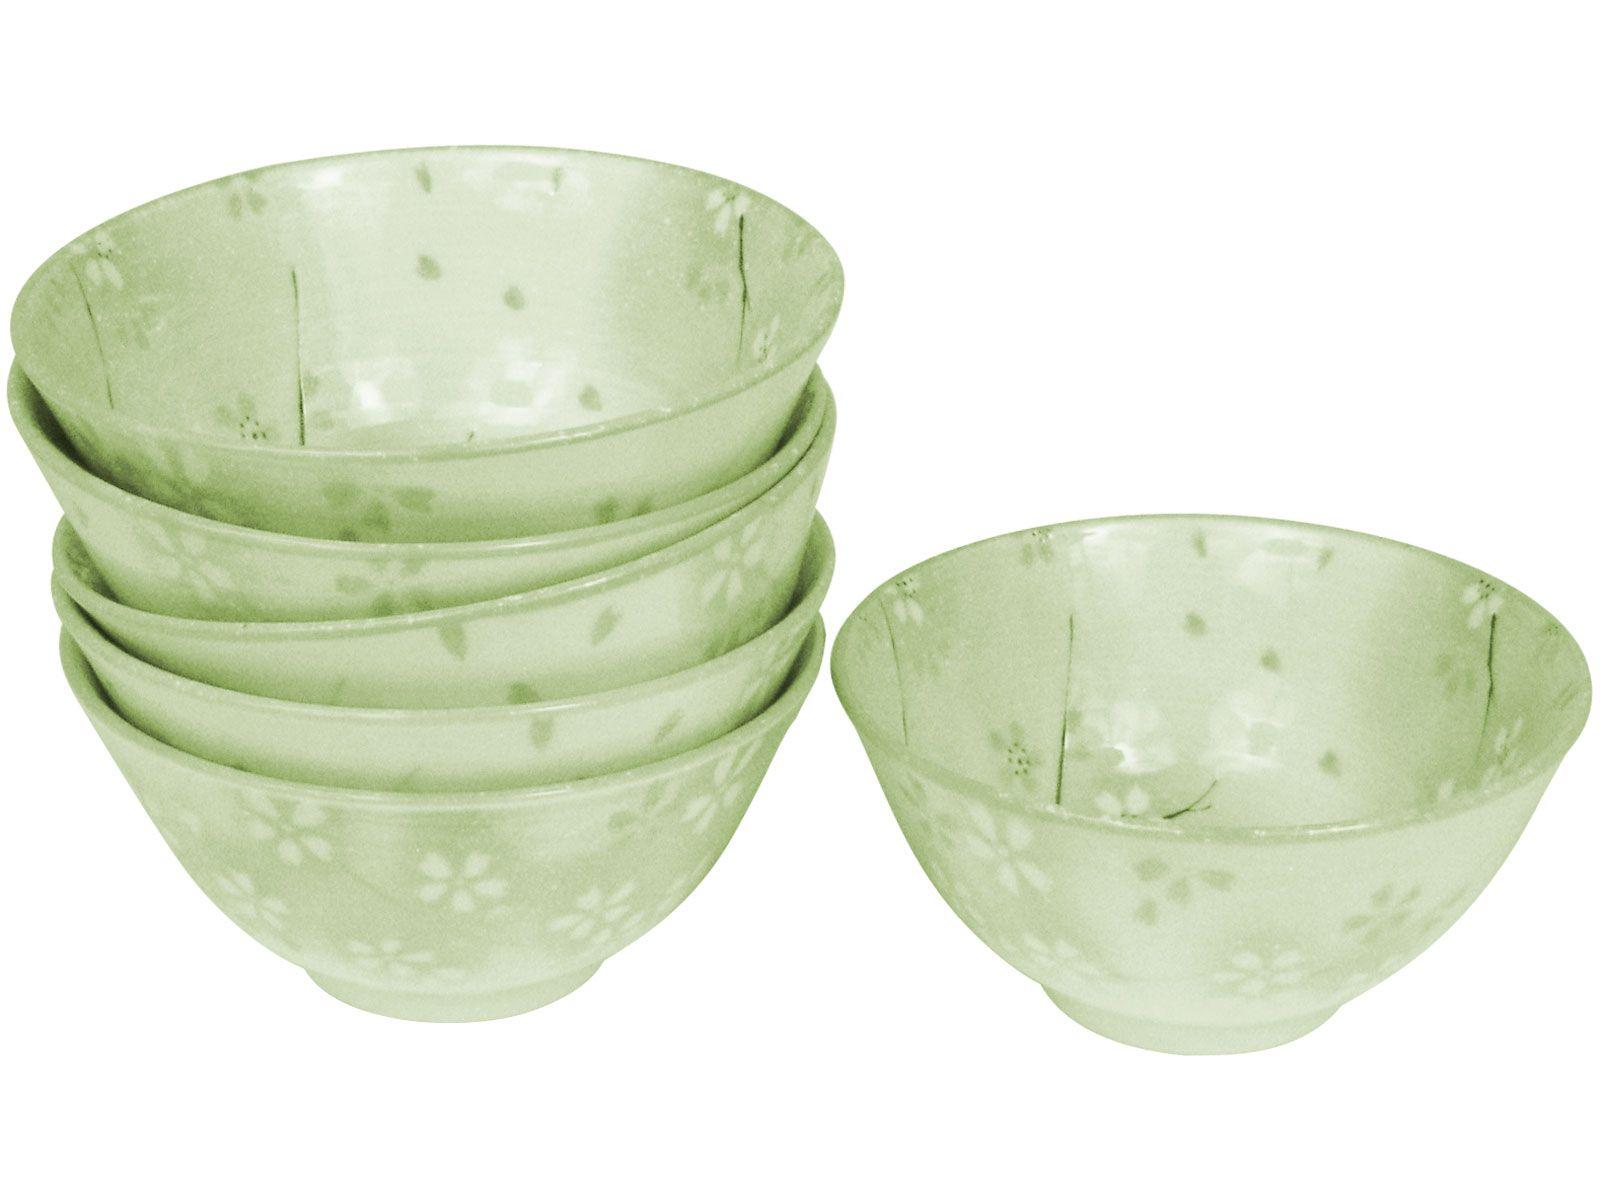 Summer Green Sakura Porcelain Soup Bowl Set For Six With Images Bowl Japanese Bowls Japanese Rice Bowl